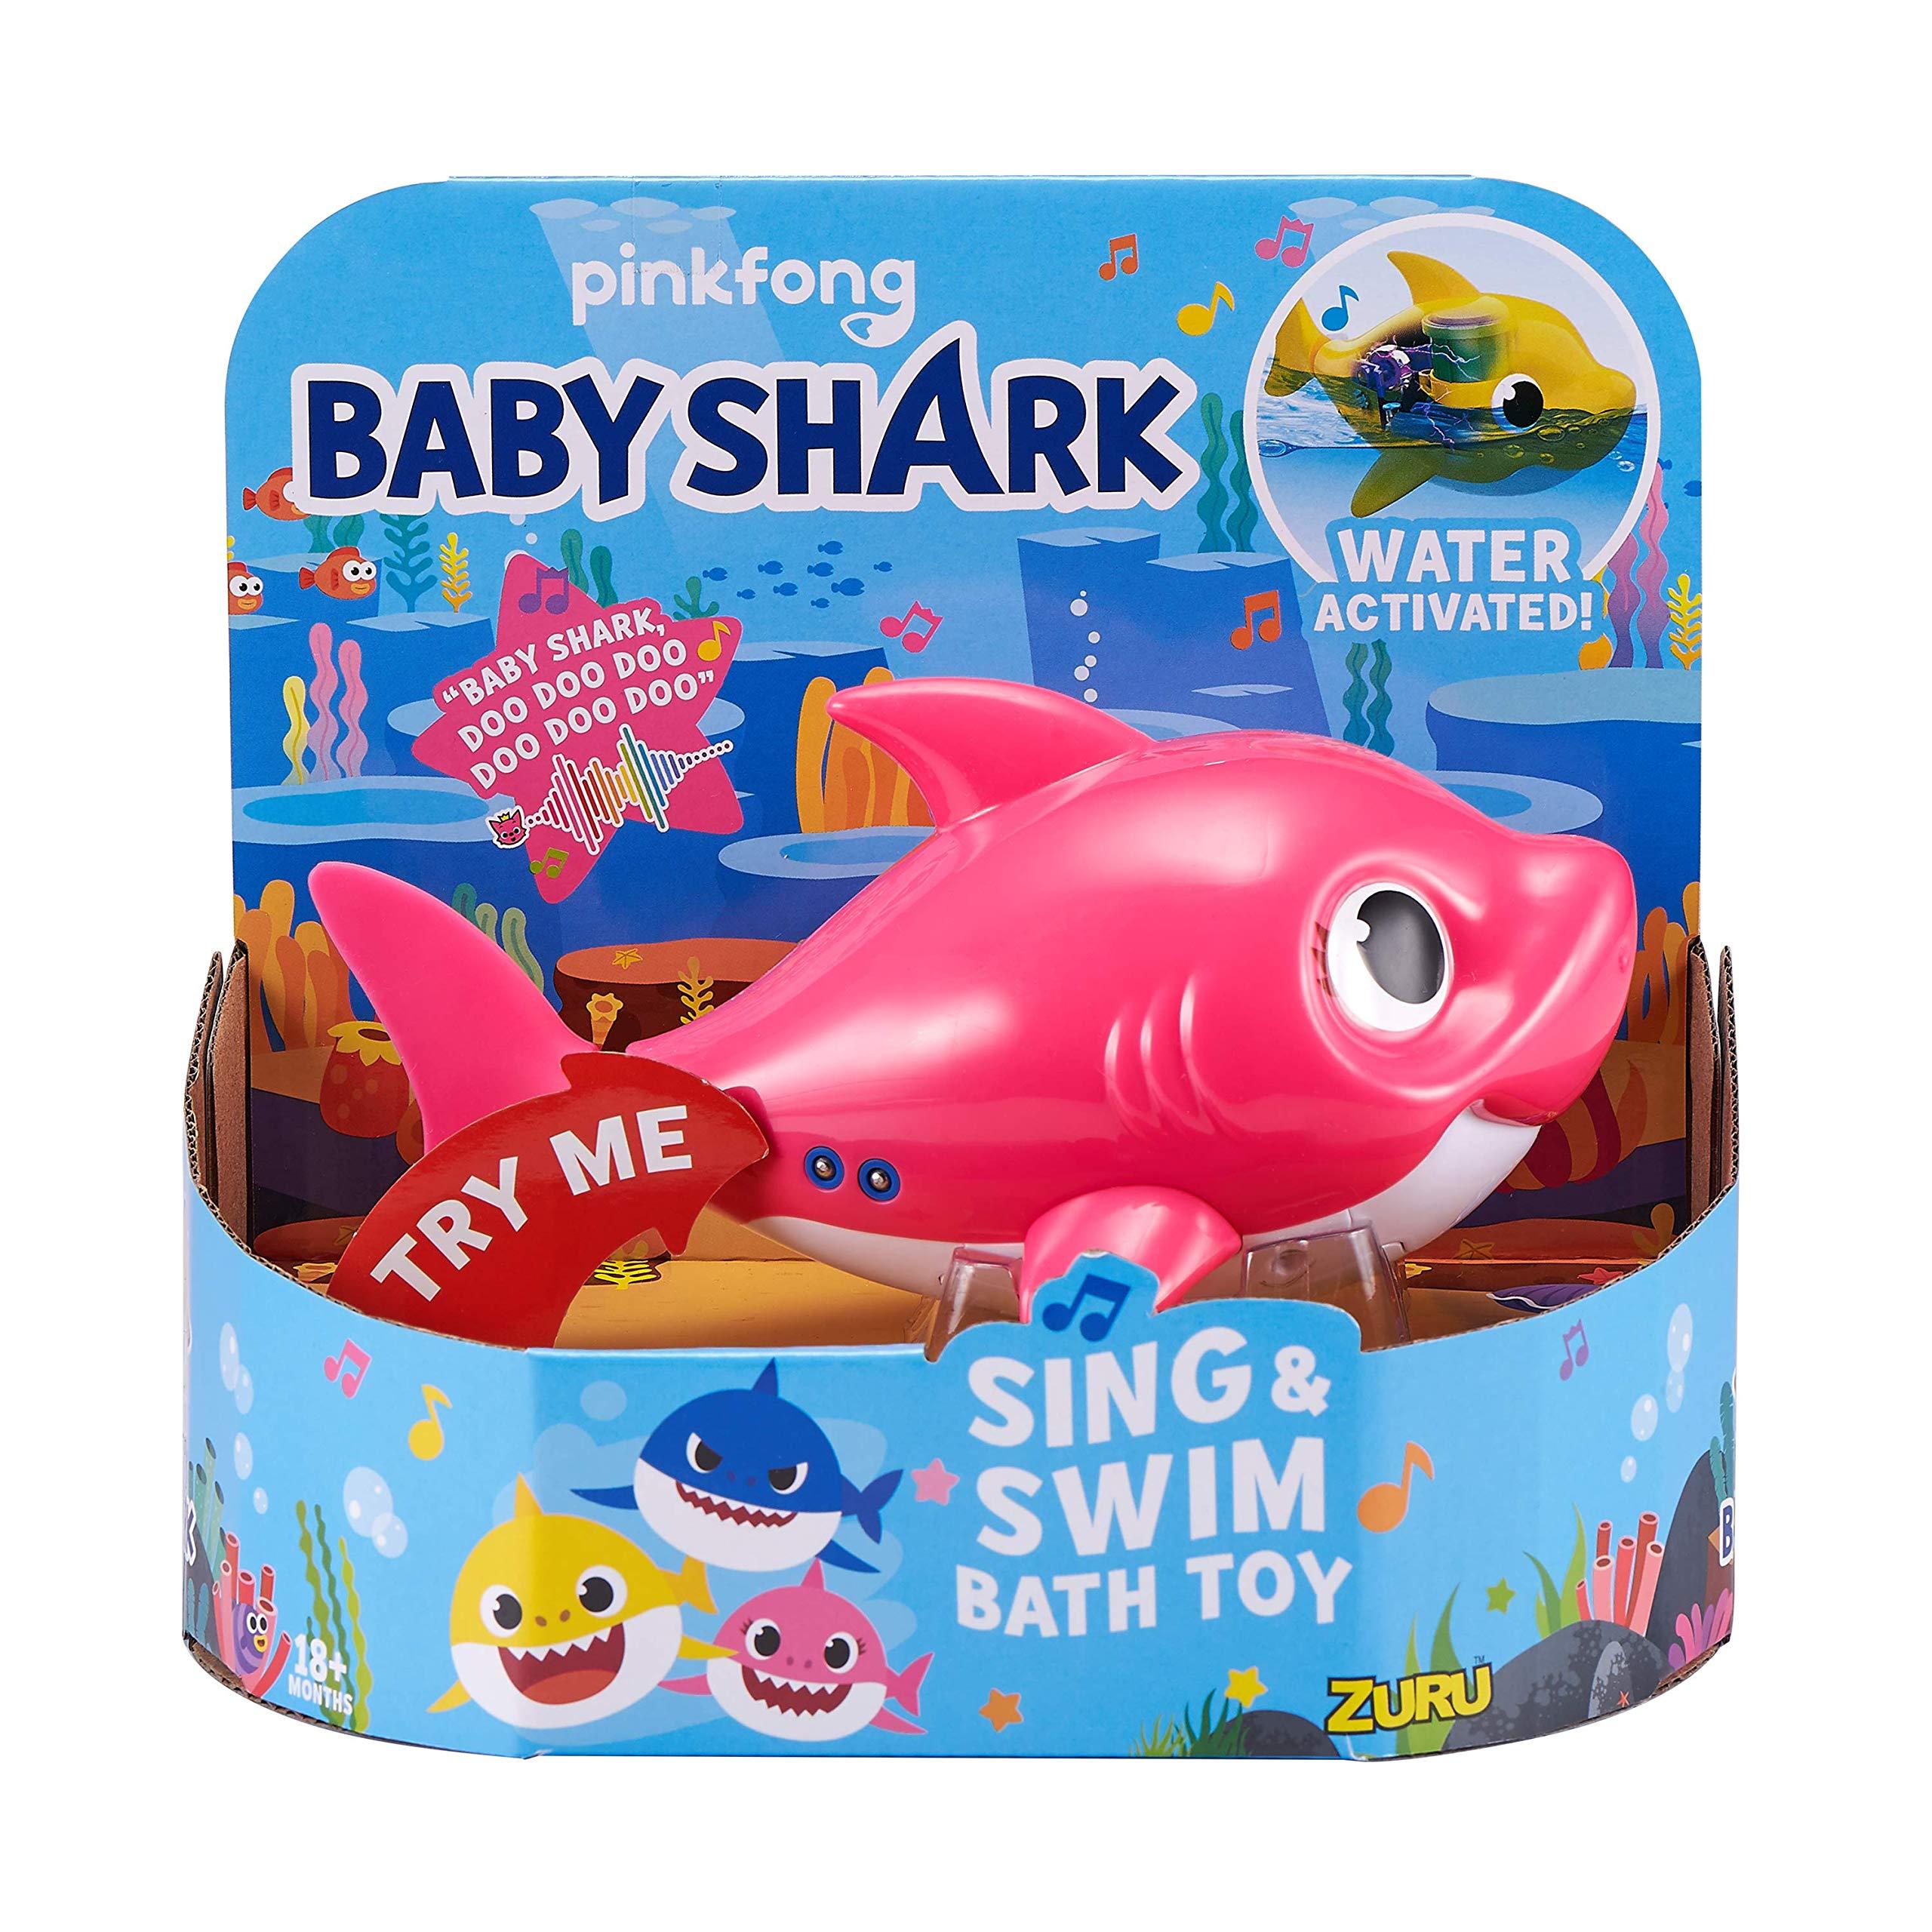 Robo Alive Junior Baby Shark Battery-Powered Sing and Swim Bath Toy by ZURU - Mommy Shark (Pink) (Custom Packaging)